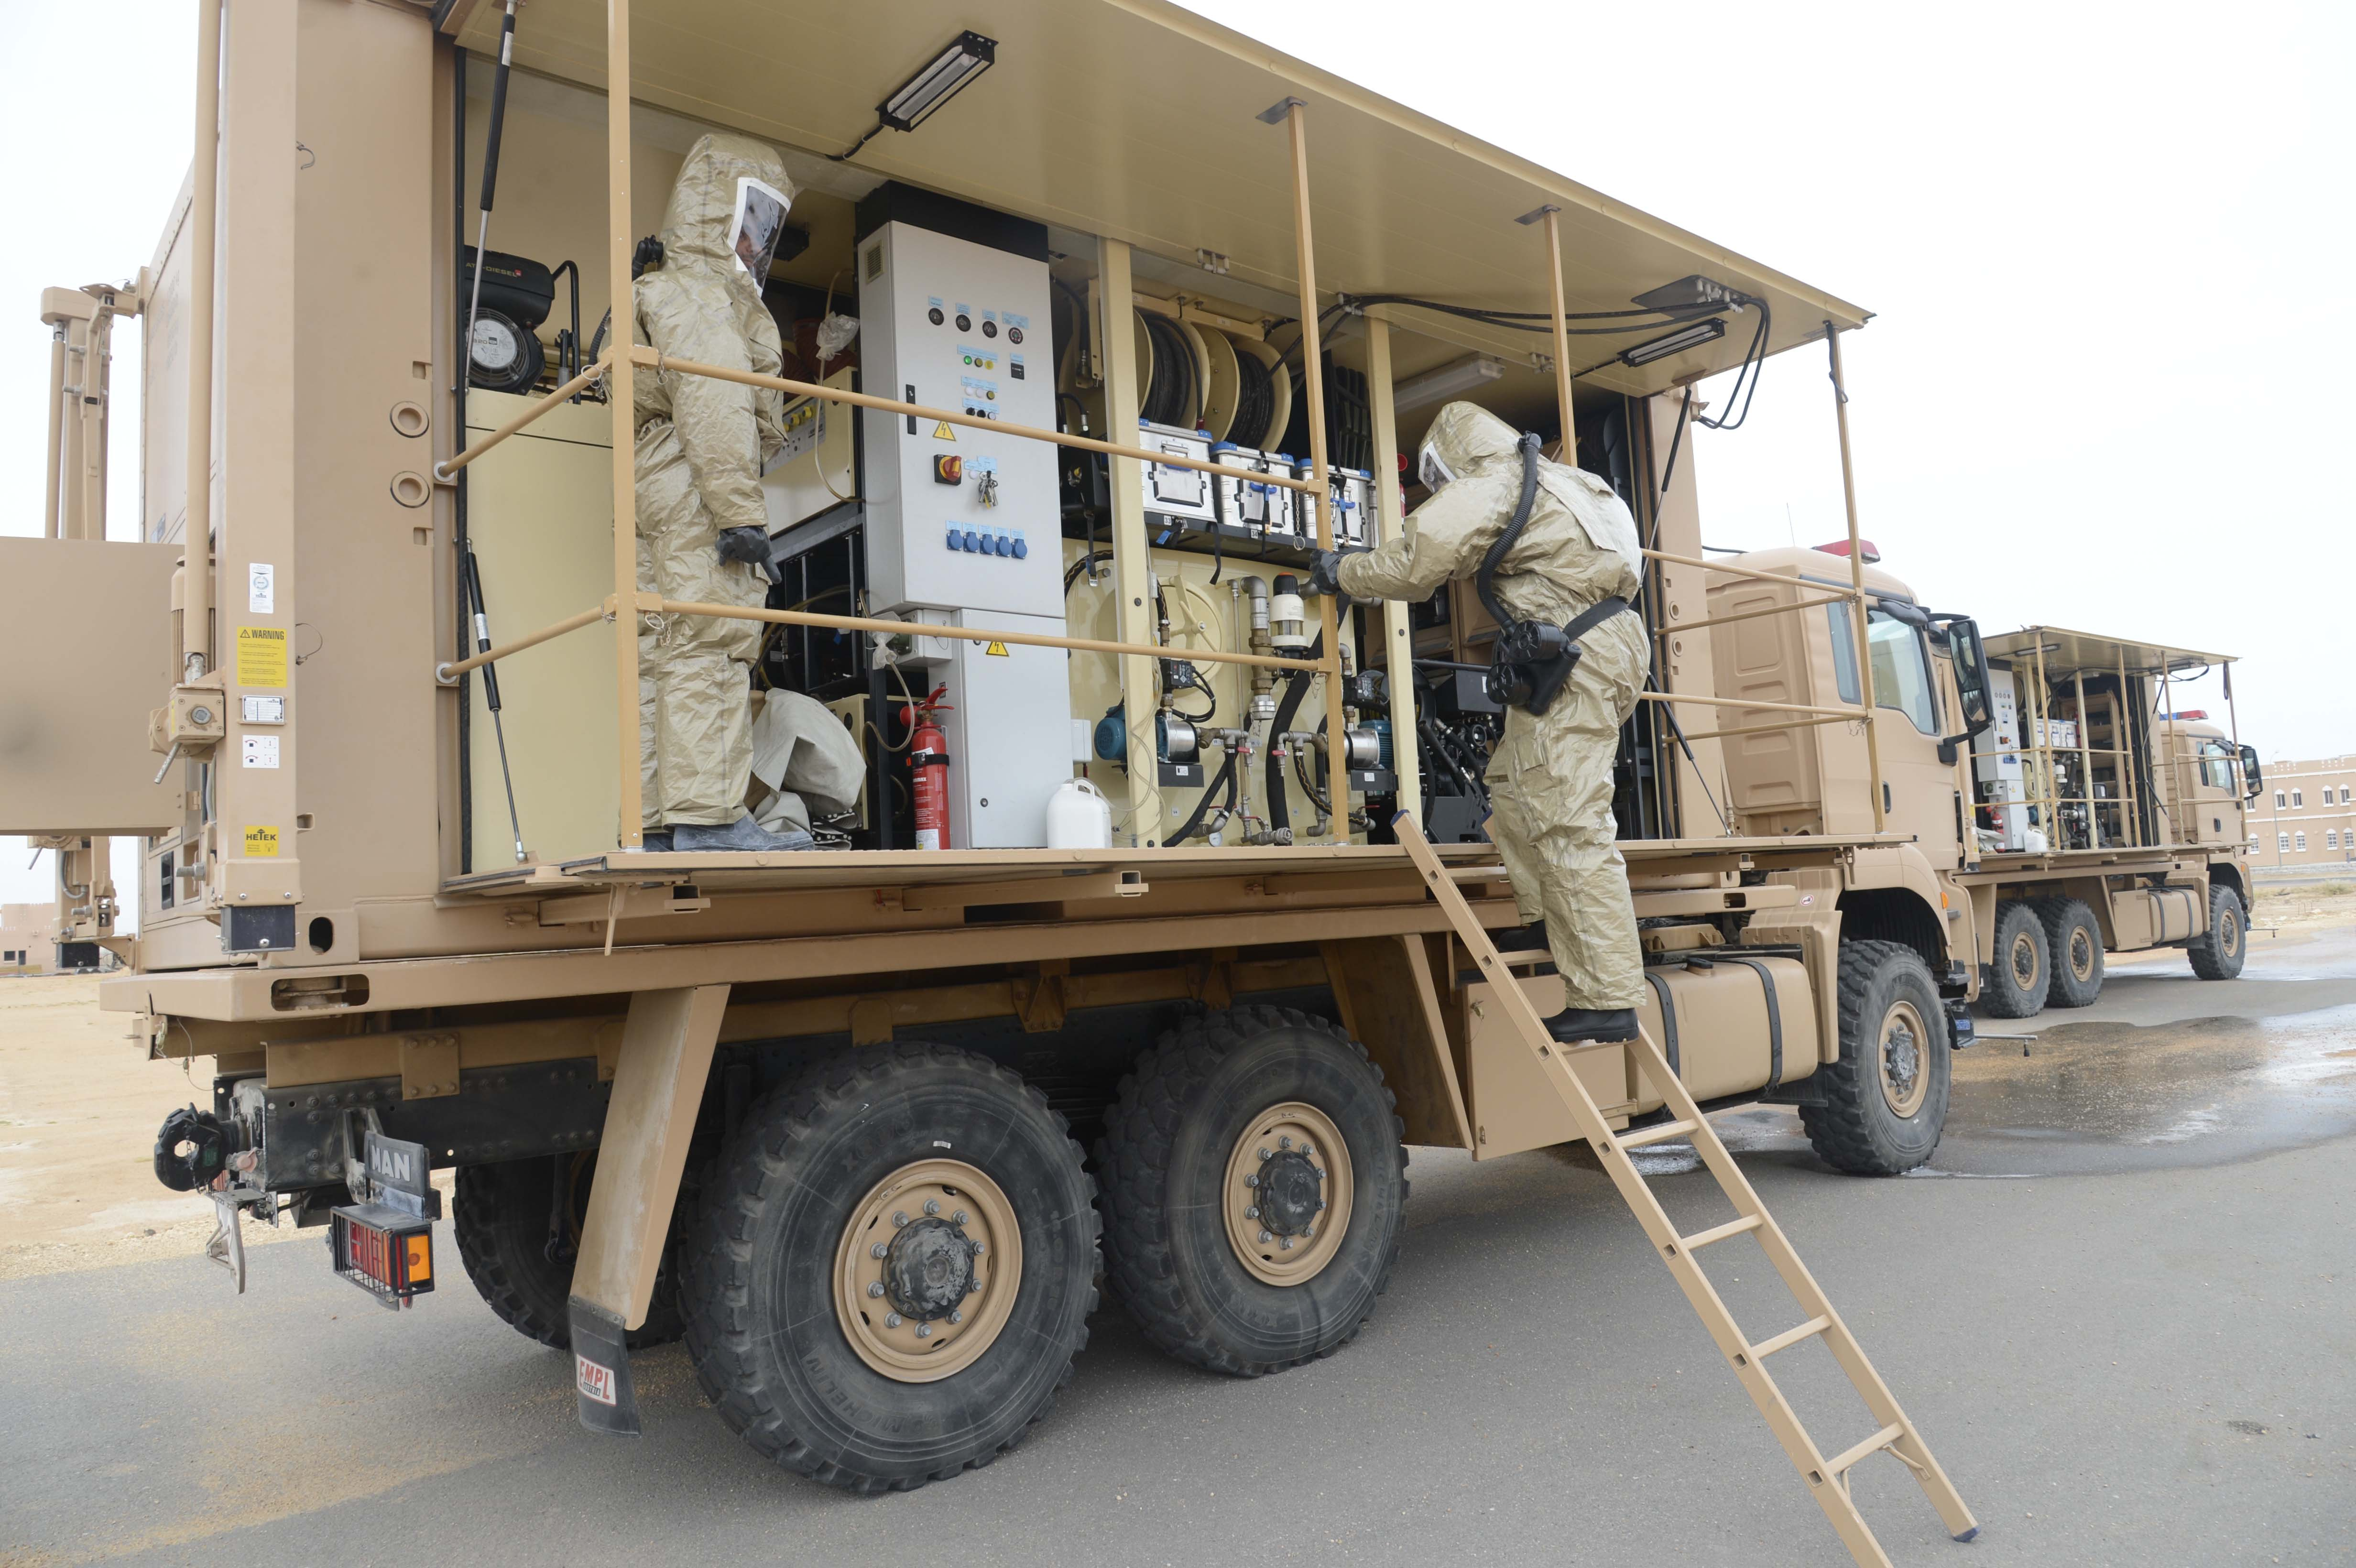 Royal Army of Oman continues sterilisation efforts